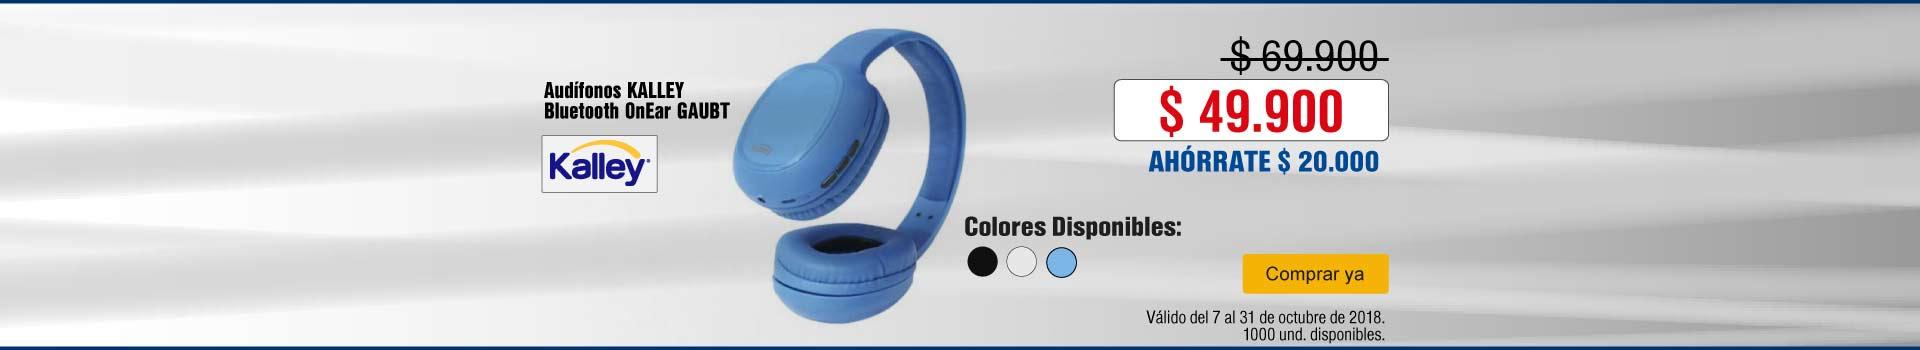 HIPER AK KT-12-accesorios-PP--audifono-kalley-oct12